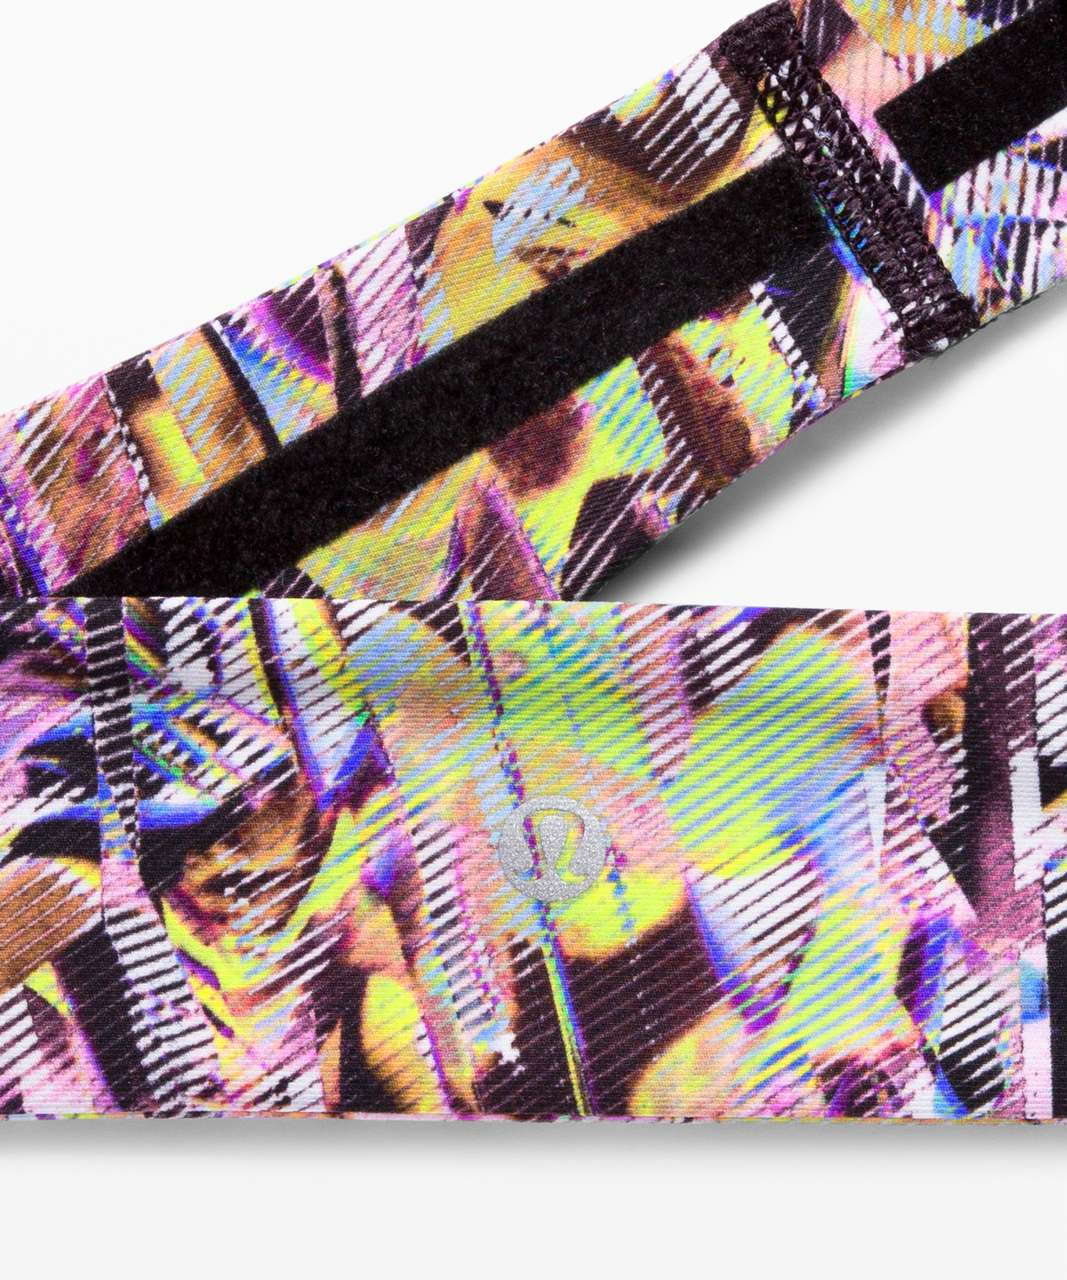 Lululemon Fly Away Tamer Headband II *SeaWheeze - Super Sonic Alpine White Purple Multi